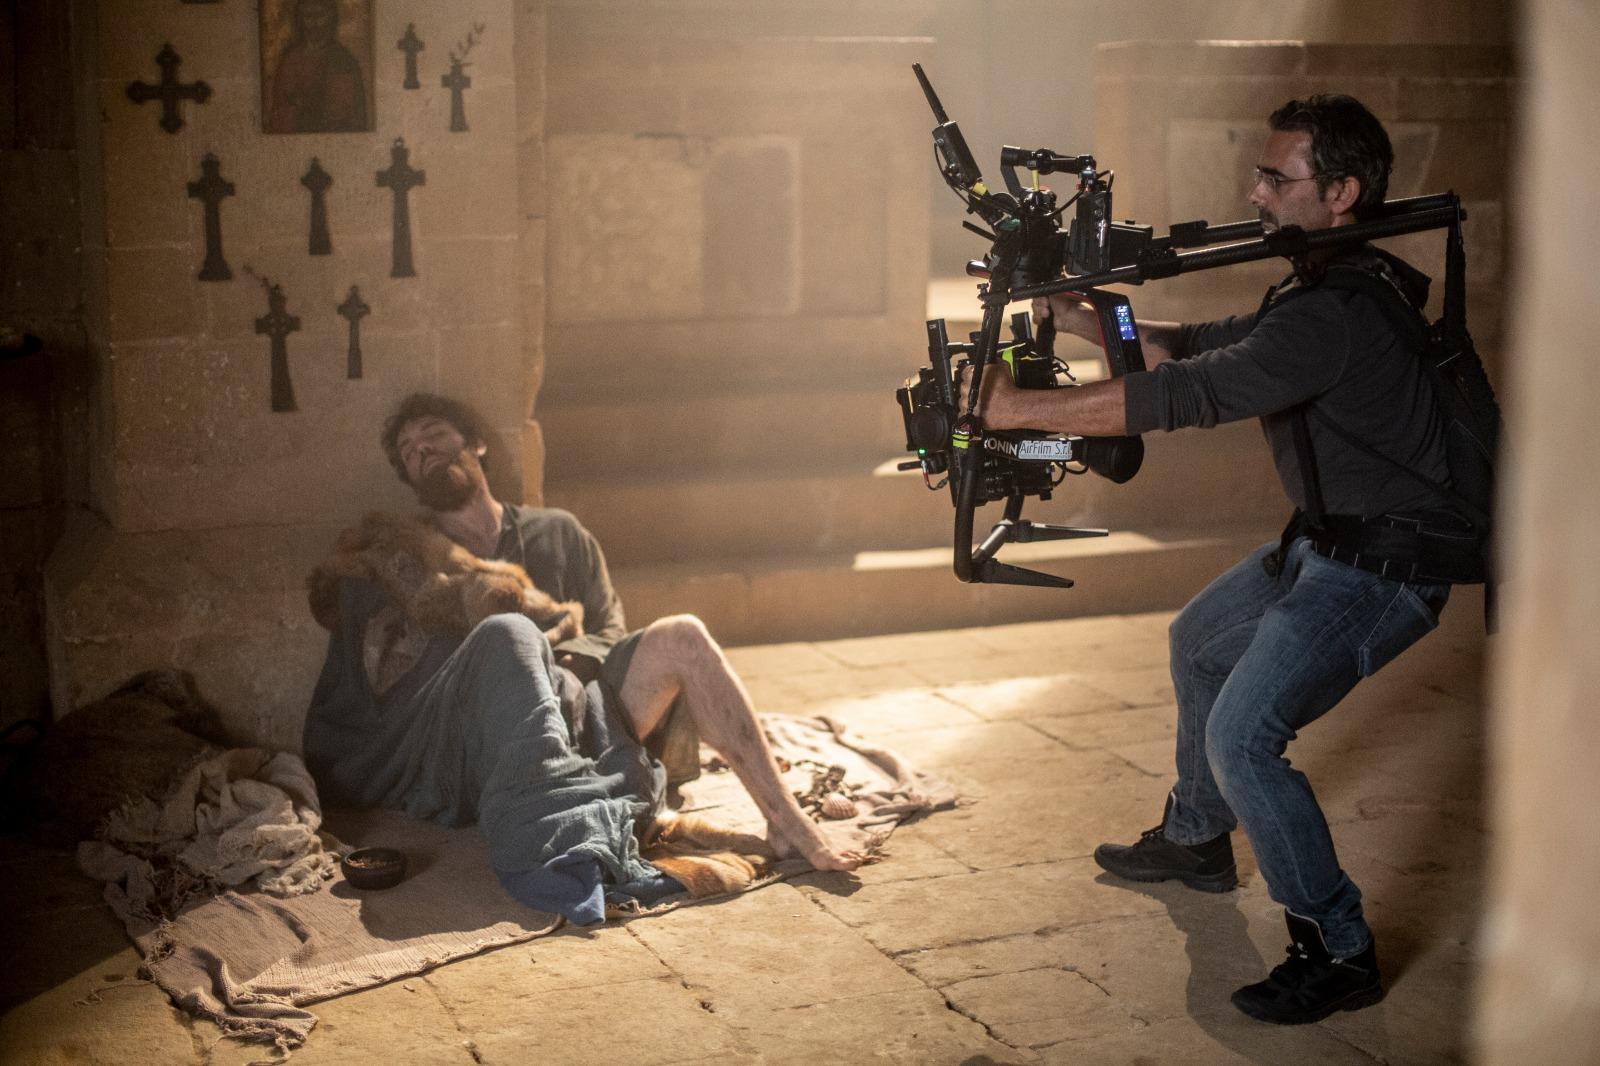 Sul set del film PARSIFAL di Marco Filiberti, Toscana